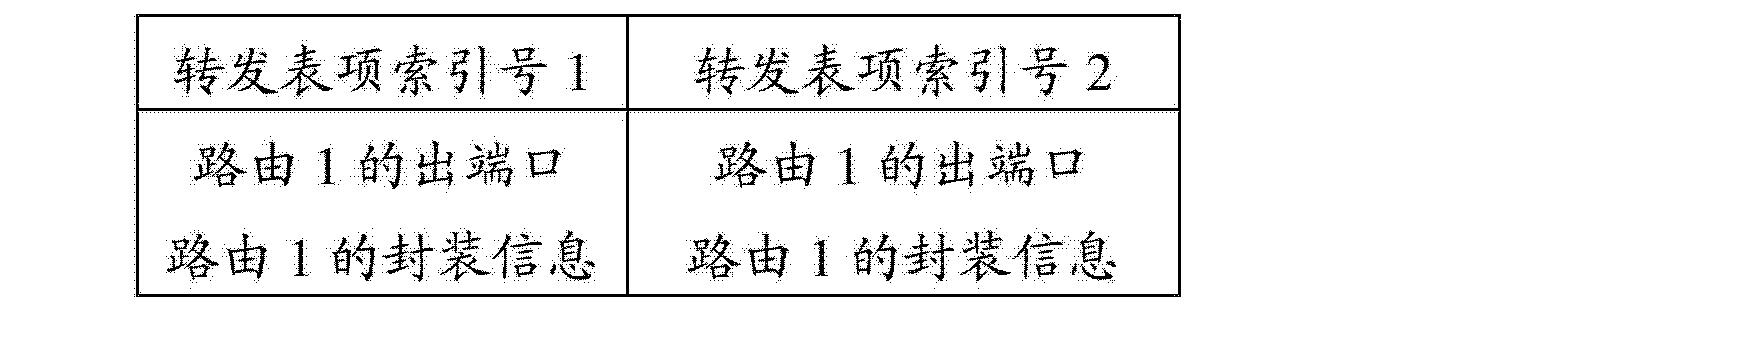 Figure CN103414651AD00082